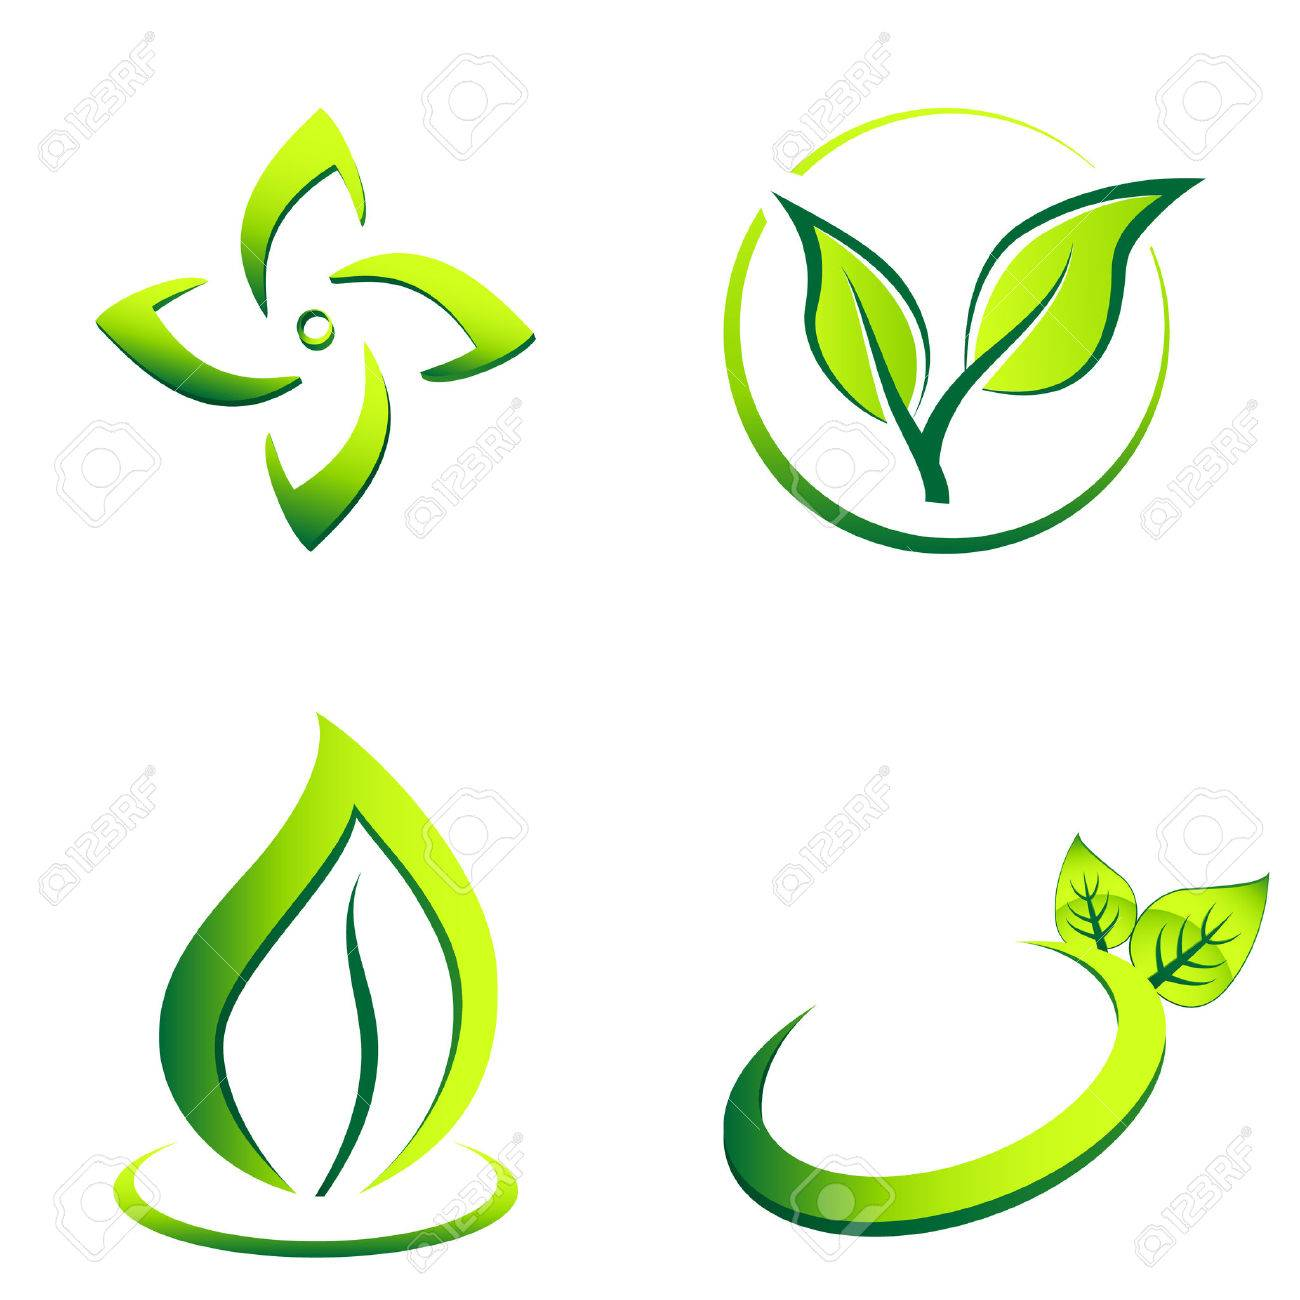 green eco icons - 24183832